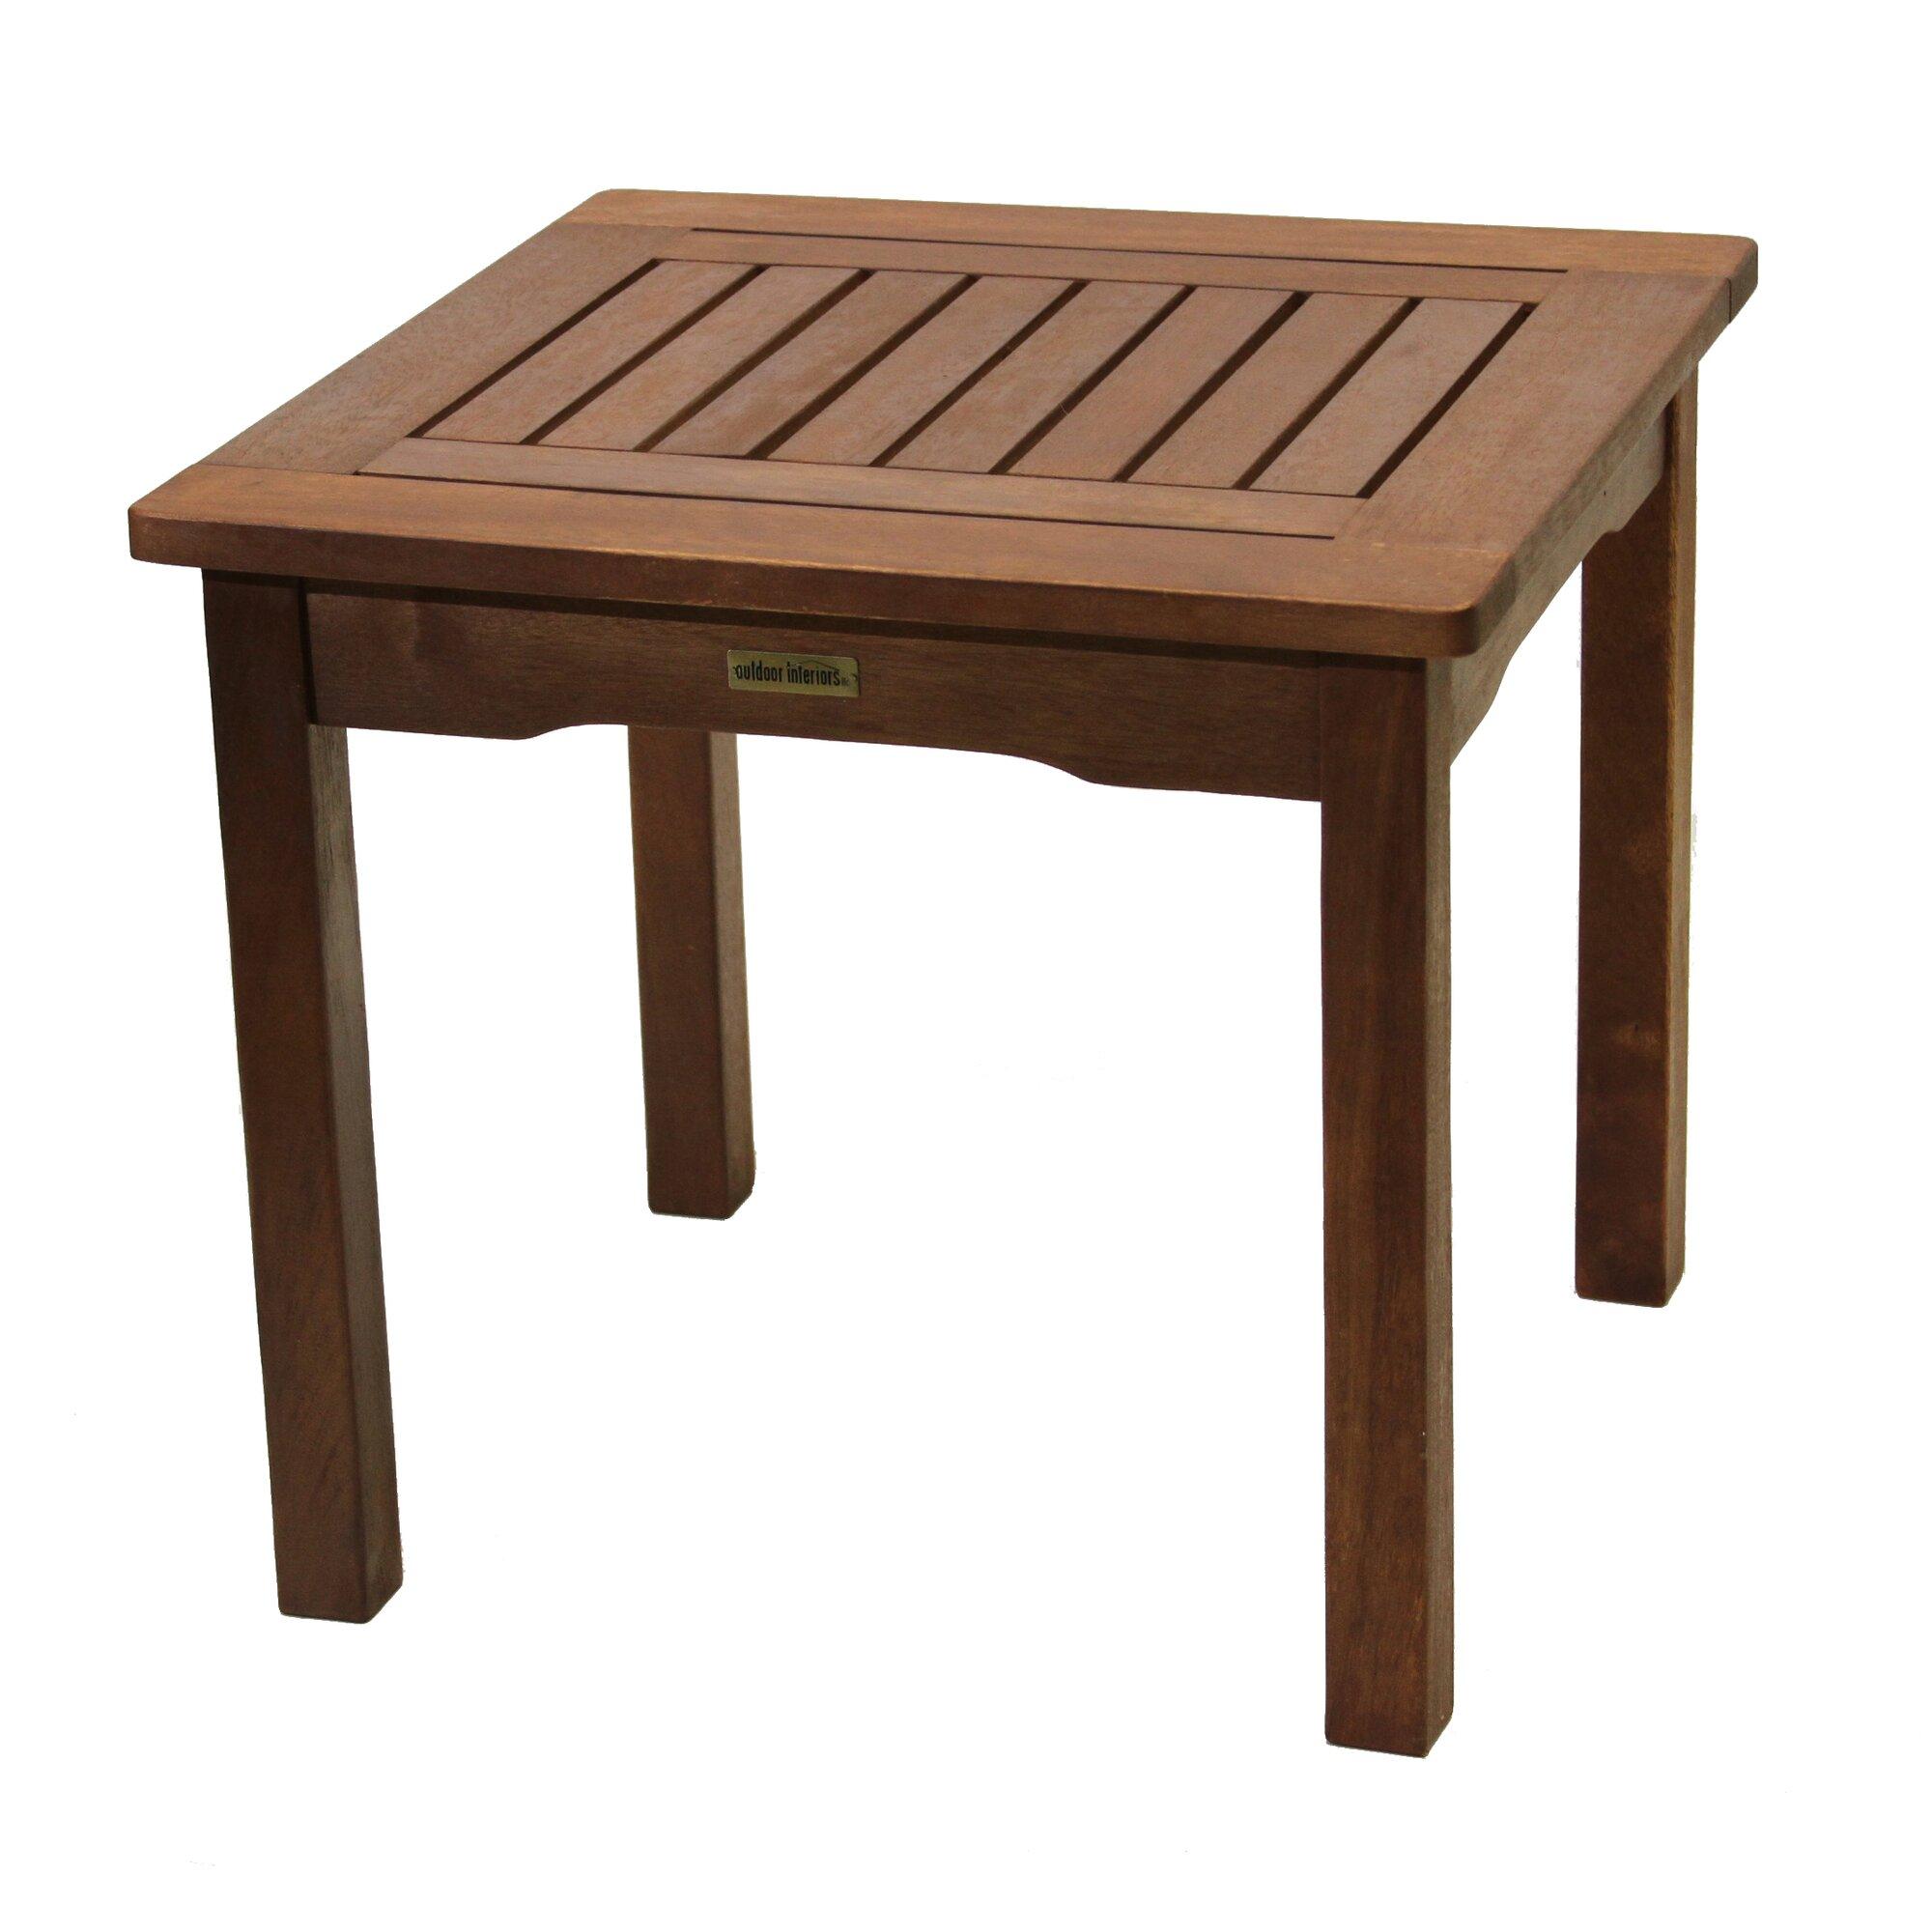 outdoor interiors beistelltisch bewertungen. Black Bedroom Furniture Sets. Home Design Ideas